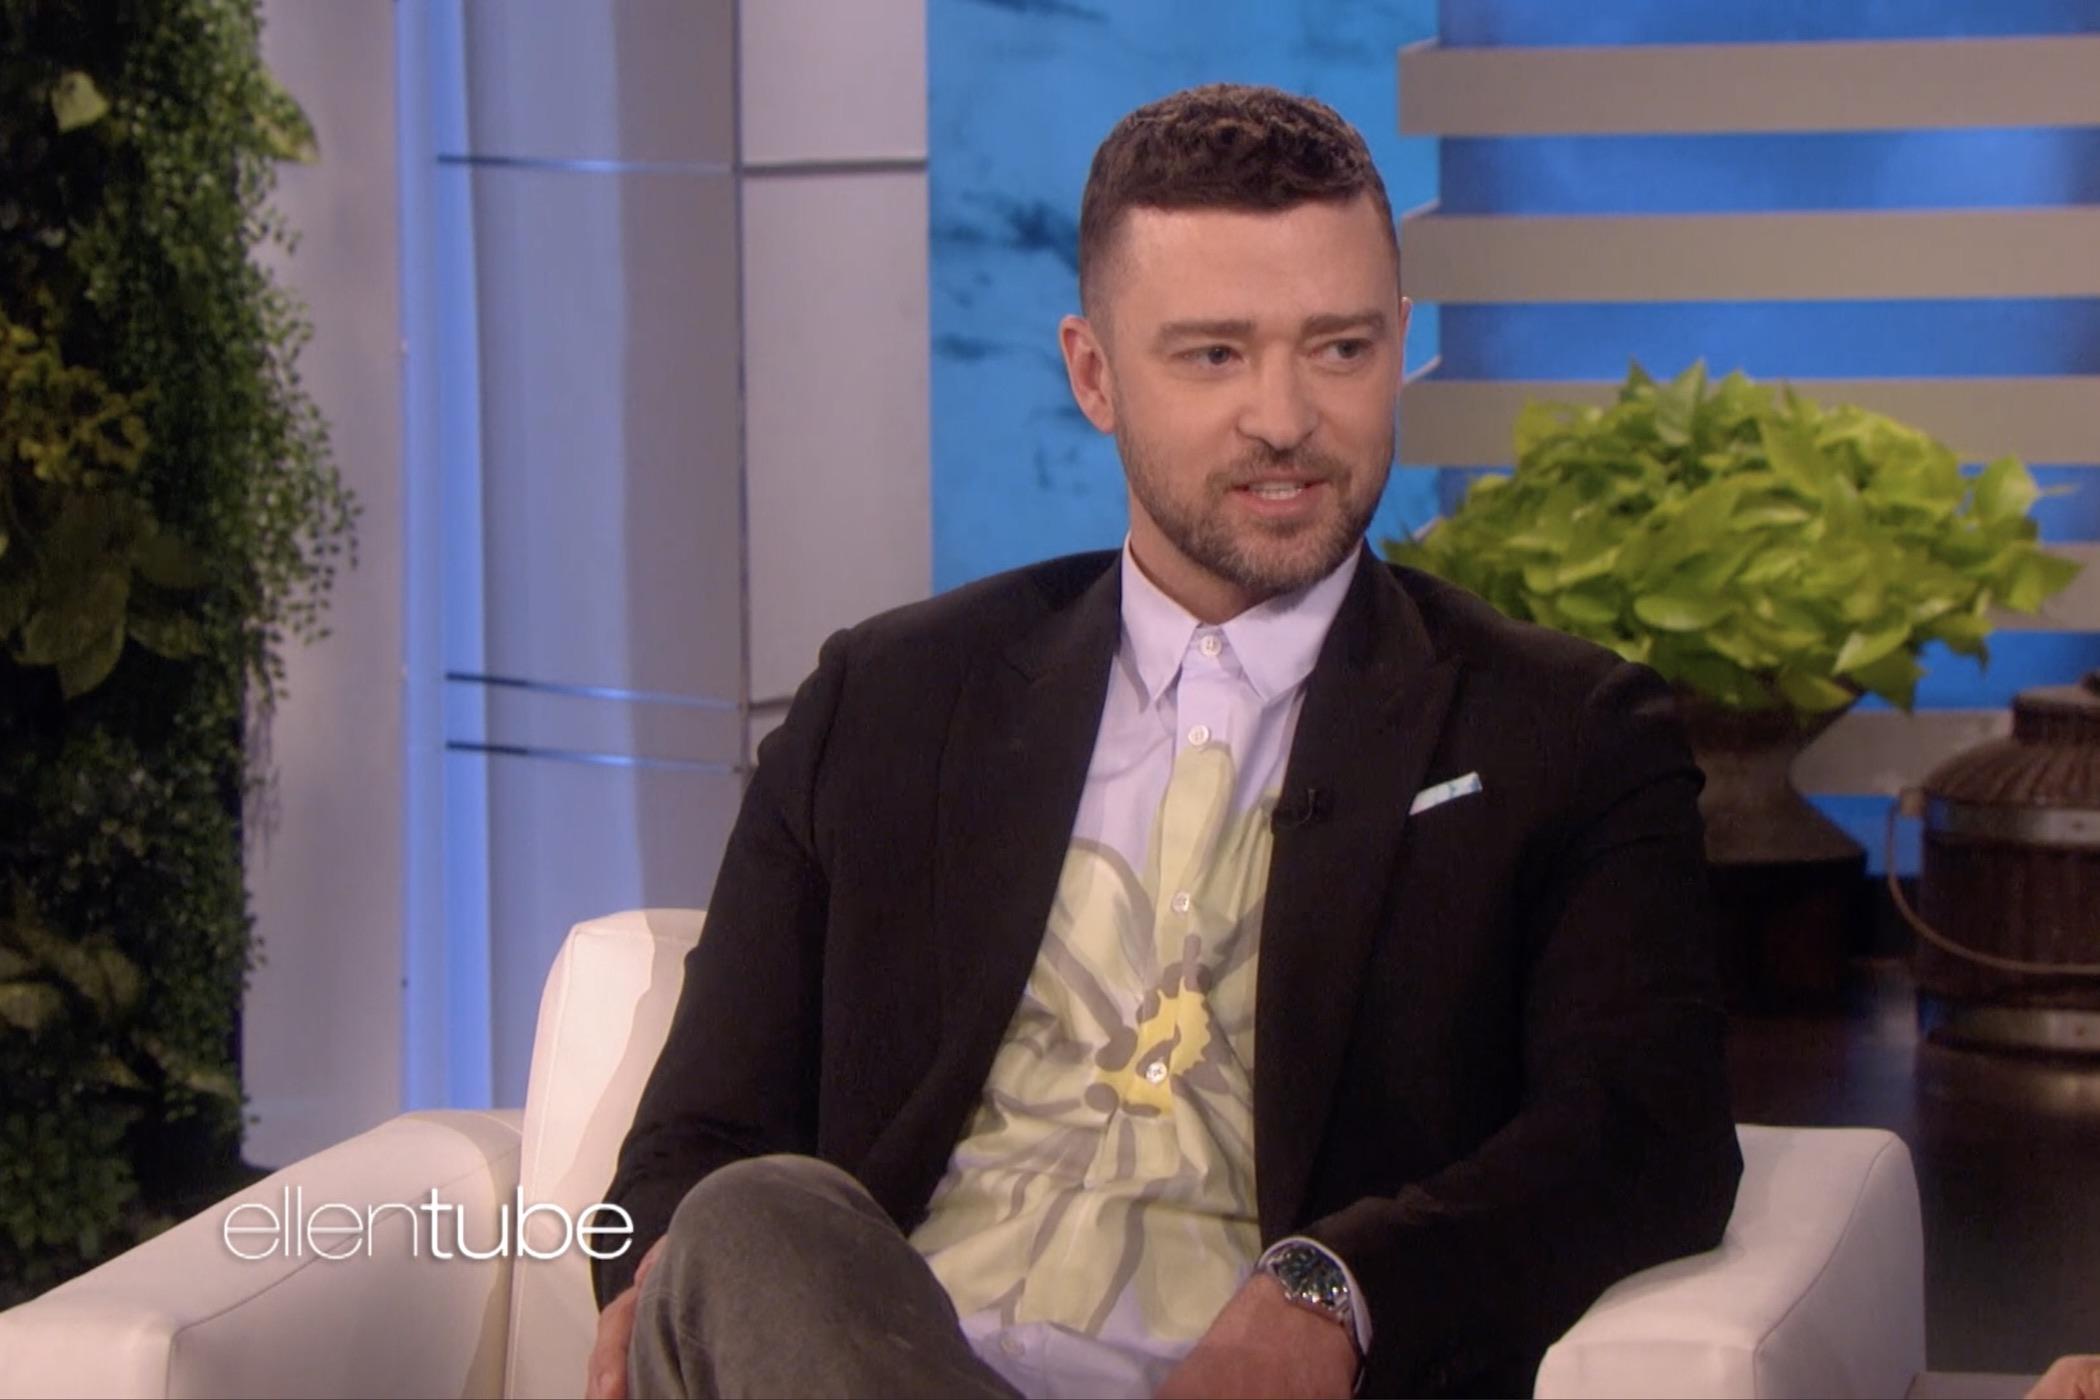 Justin Timberlake Rolex Milgauss Z Blue 116400GV The Ellen Show